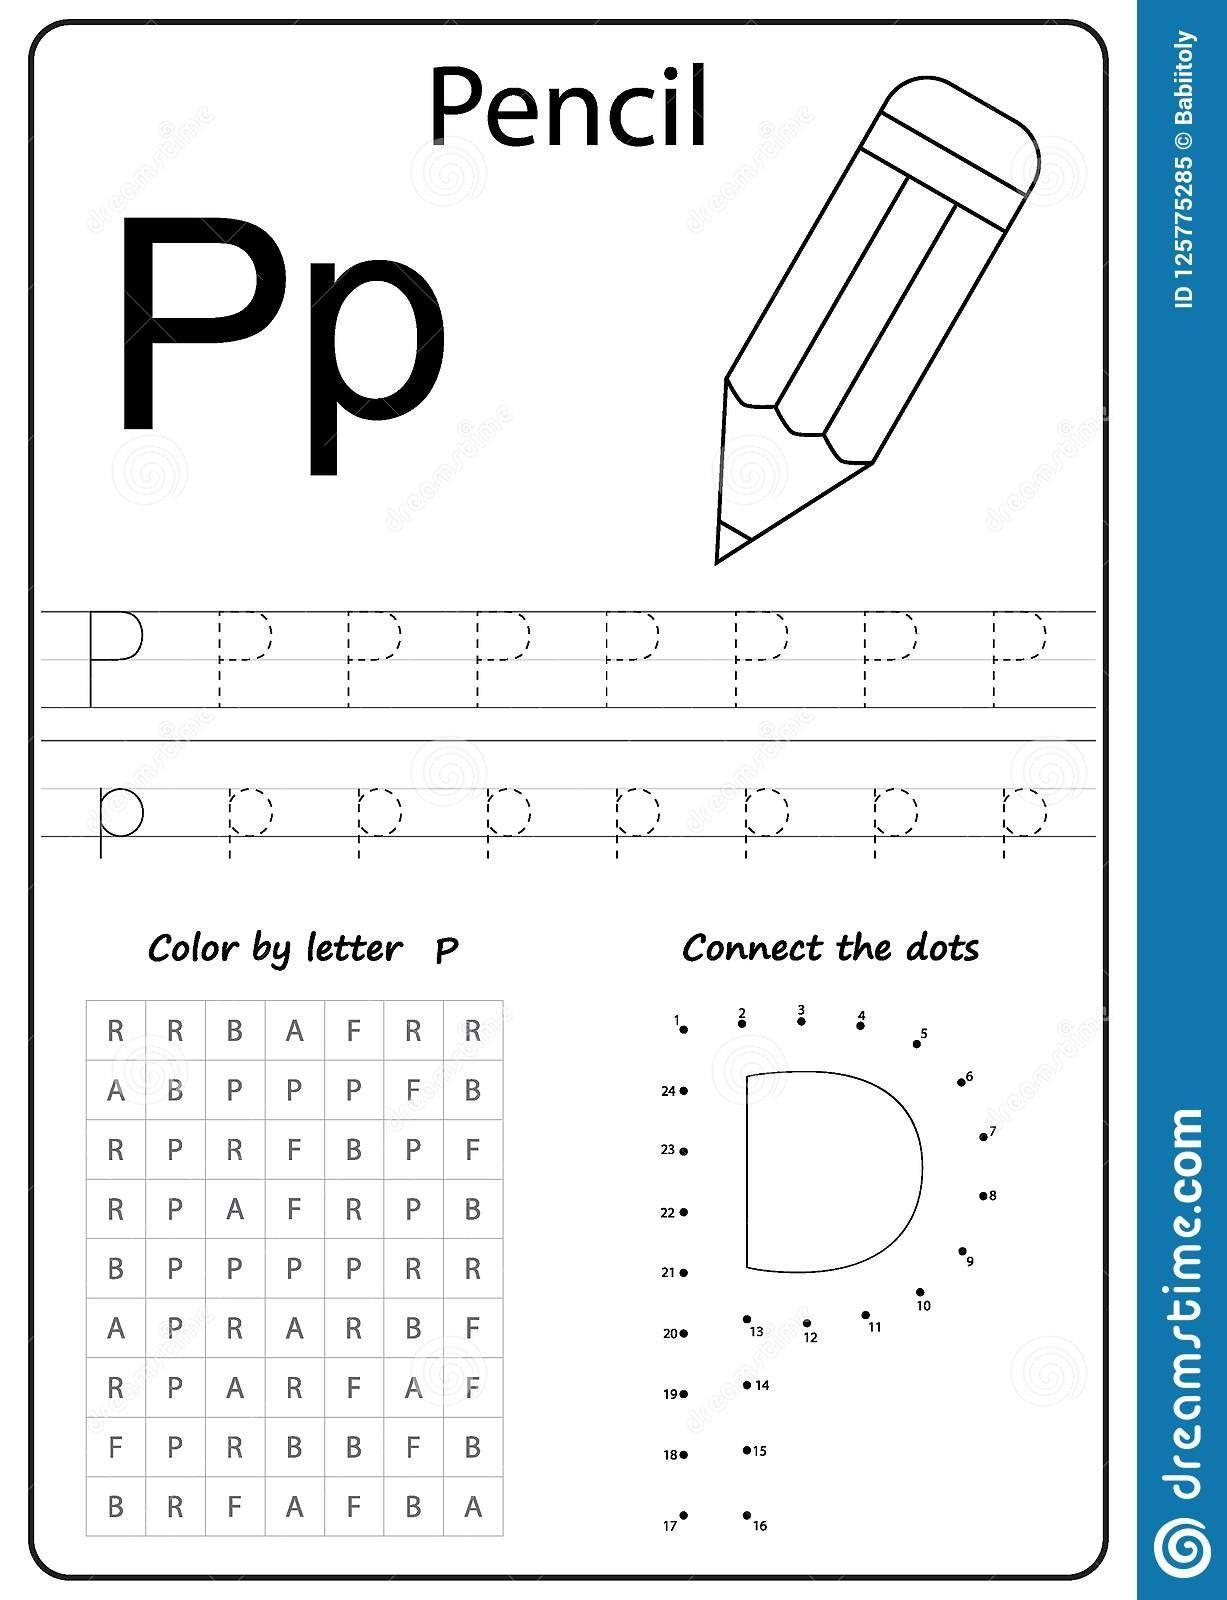 4 Worksheet Words That Begin With P In